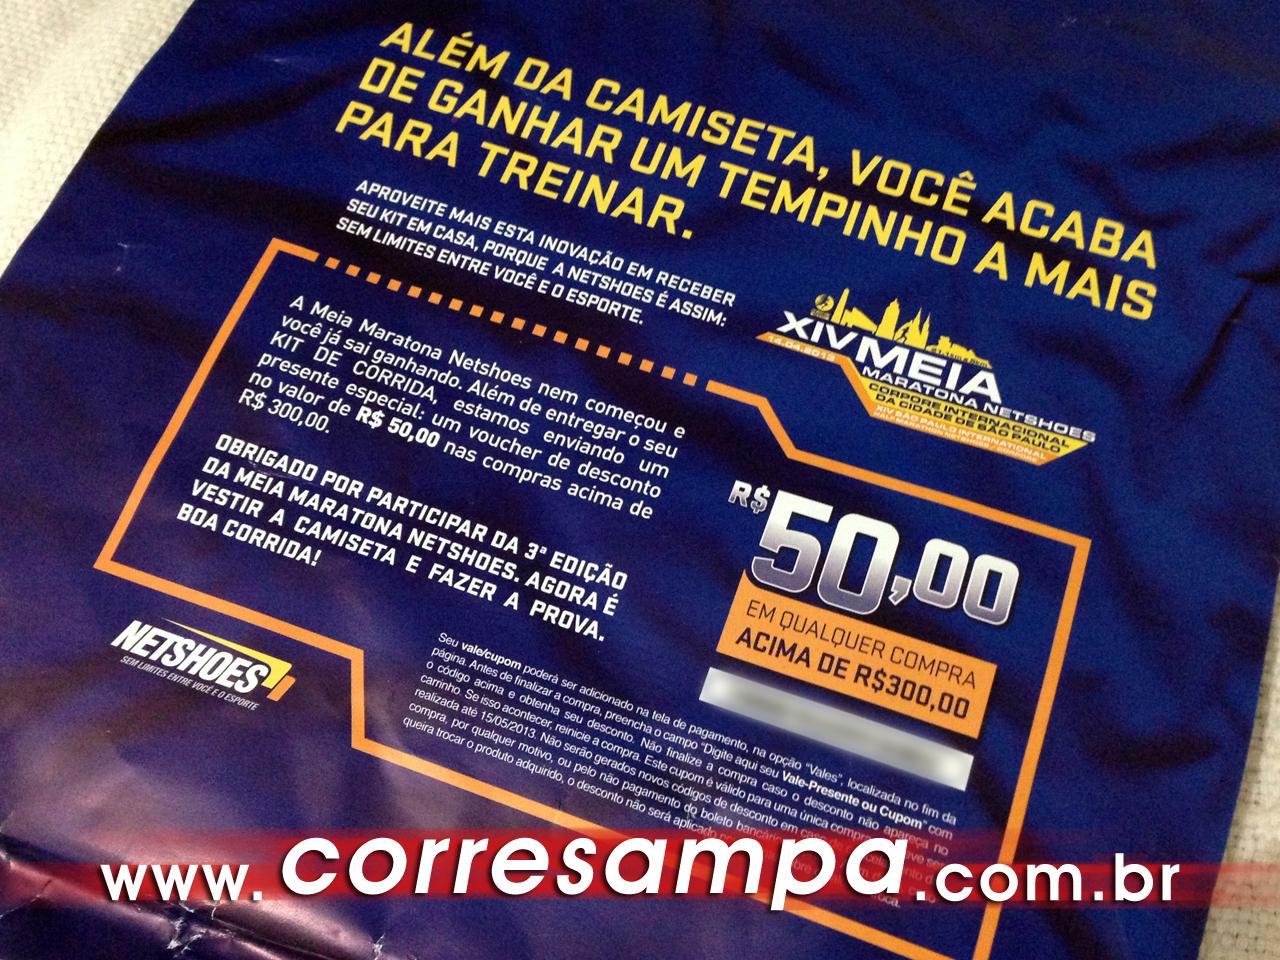 8da53642099aa RESULTADO - MEIA MARATONA NETSHOES ... - CORRE SAMPA